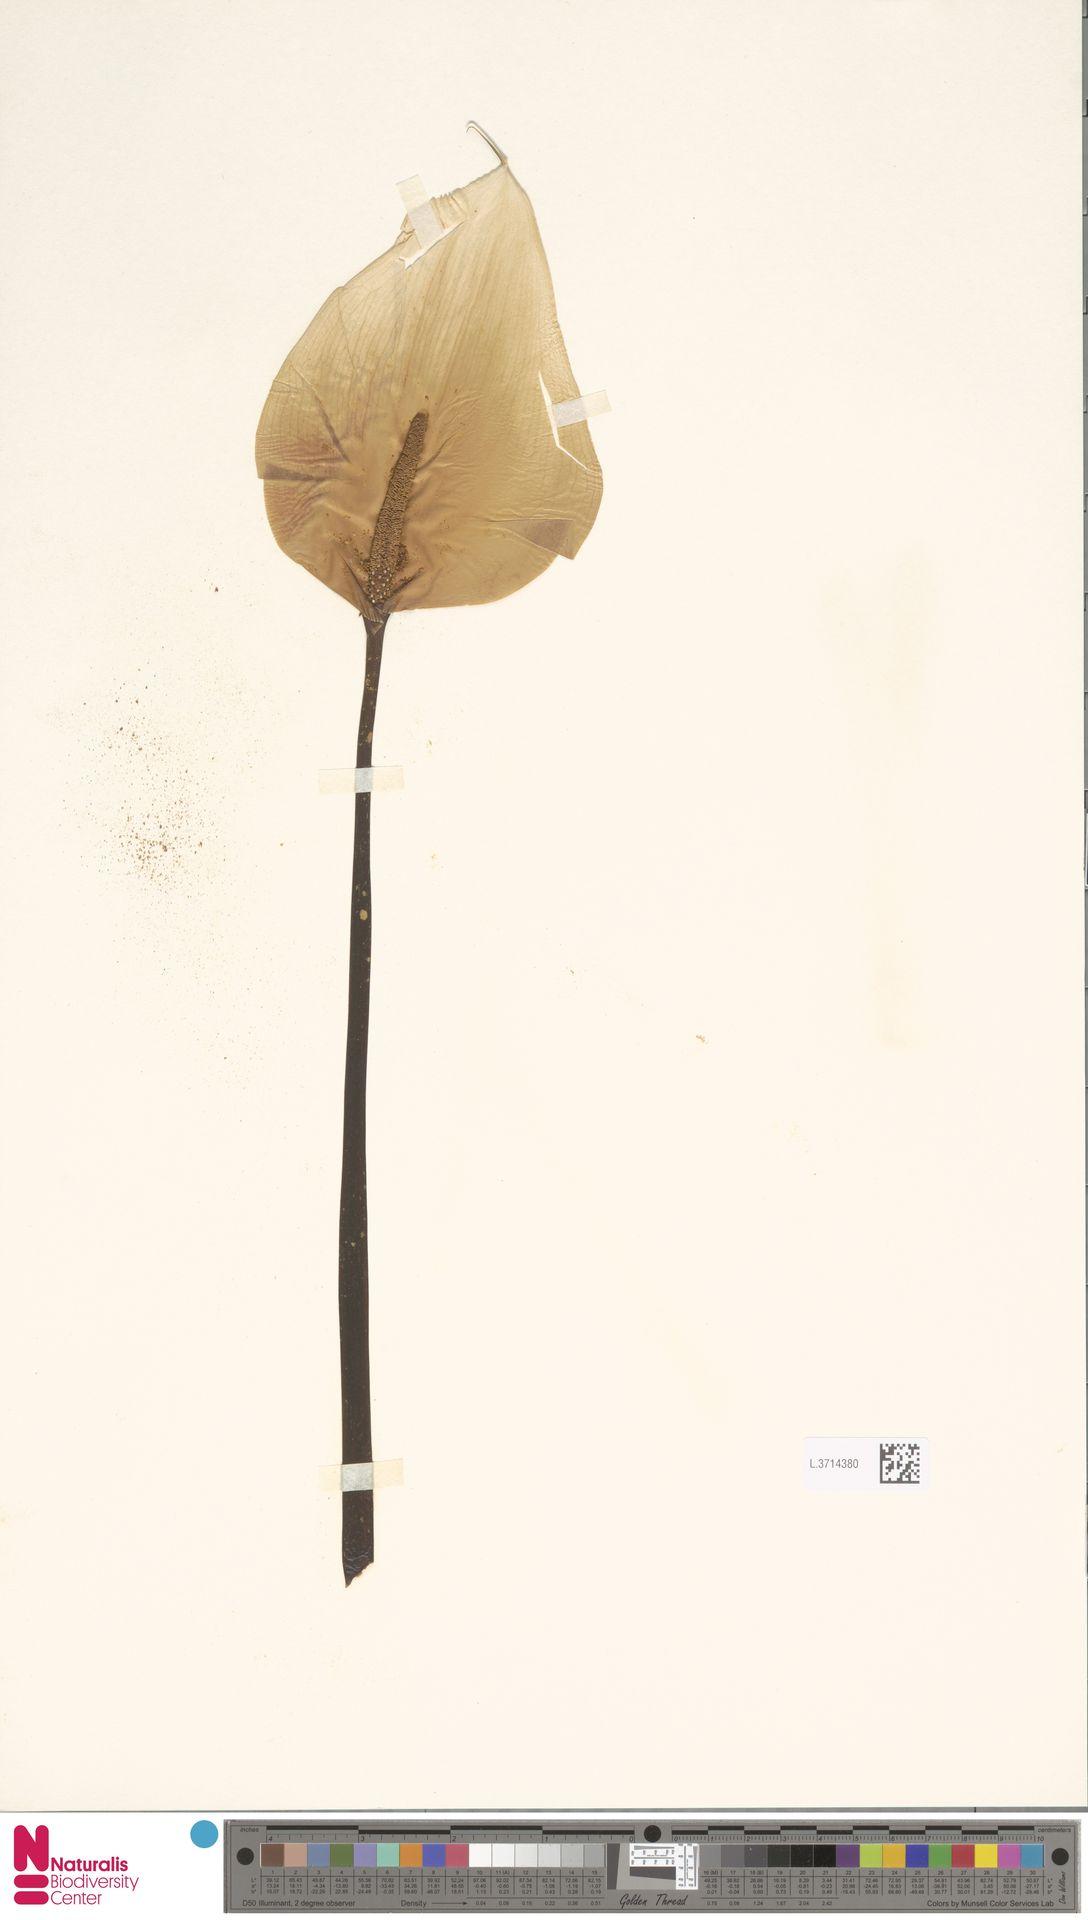 L.3714380 | Zantedeschia aethiopica (L.) Spreng.